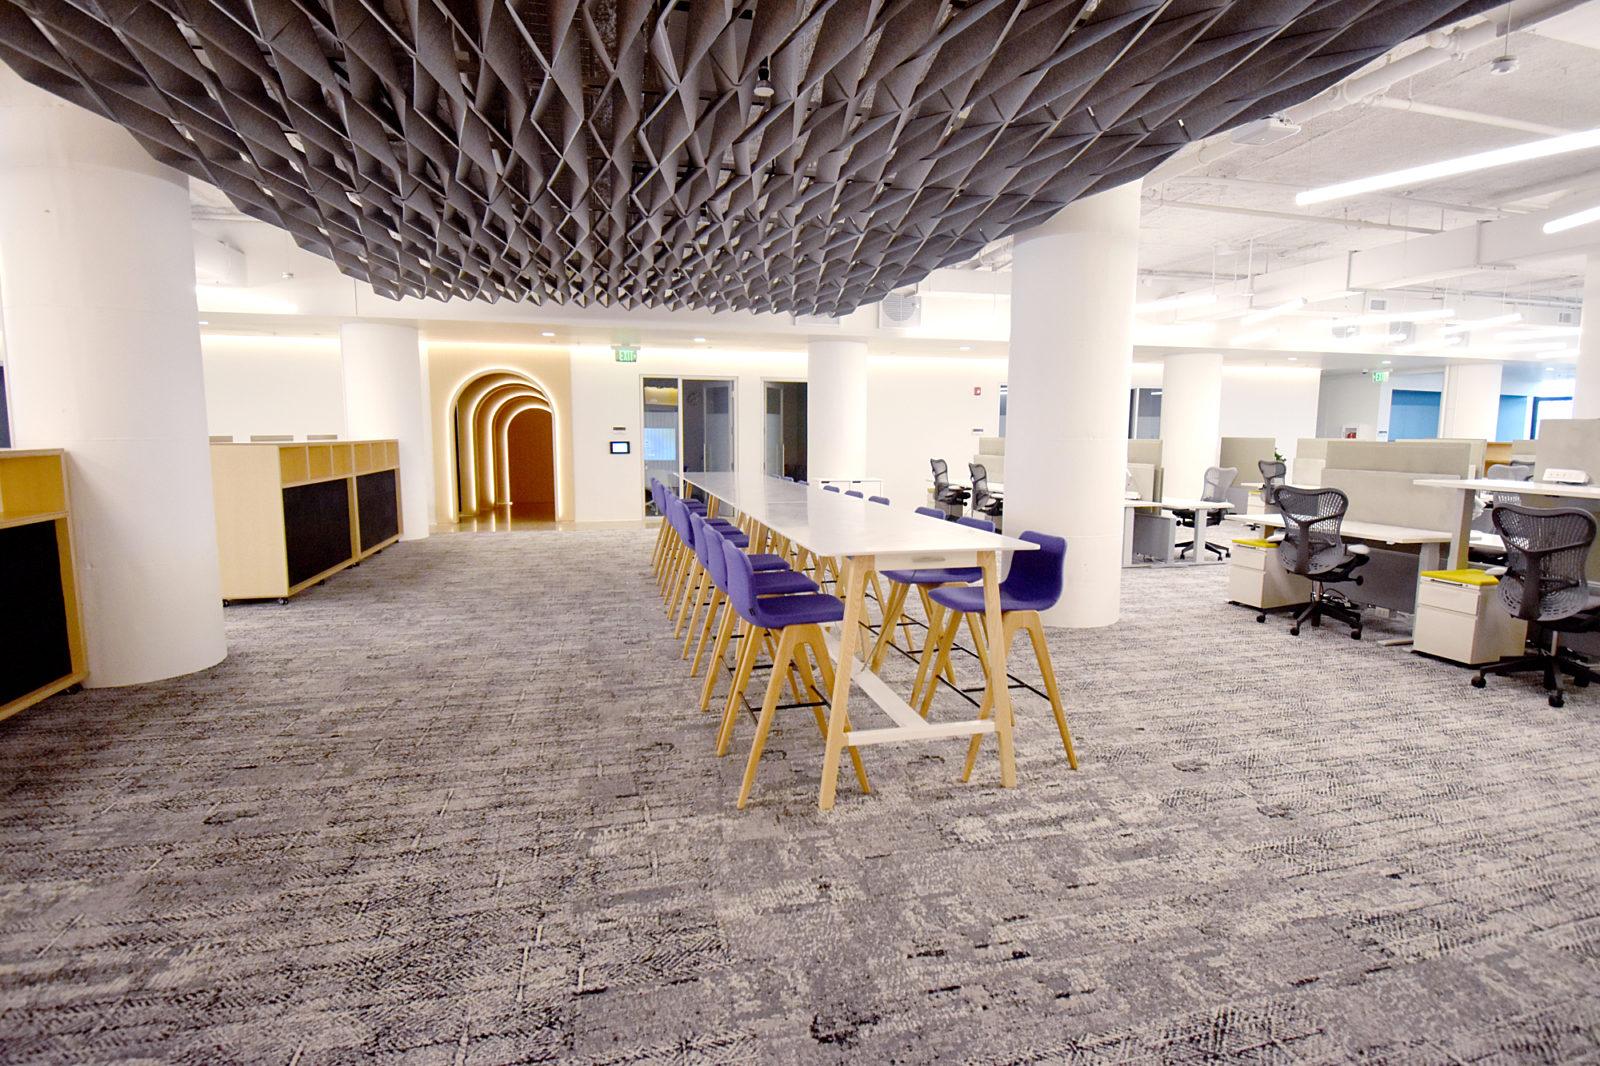 autodesk boston collaboration office furniture architizer design award client